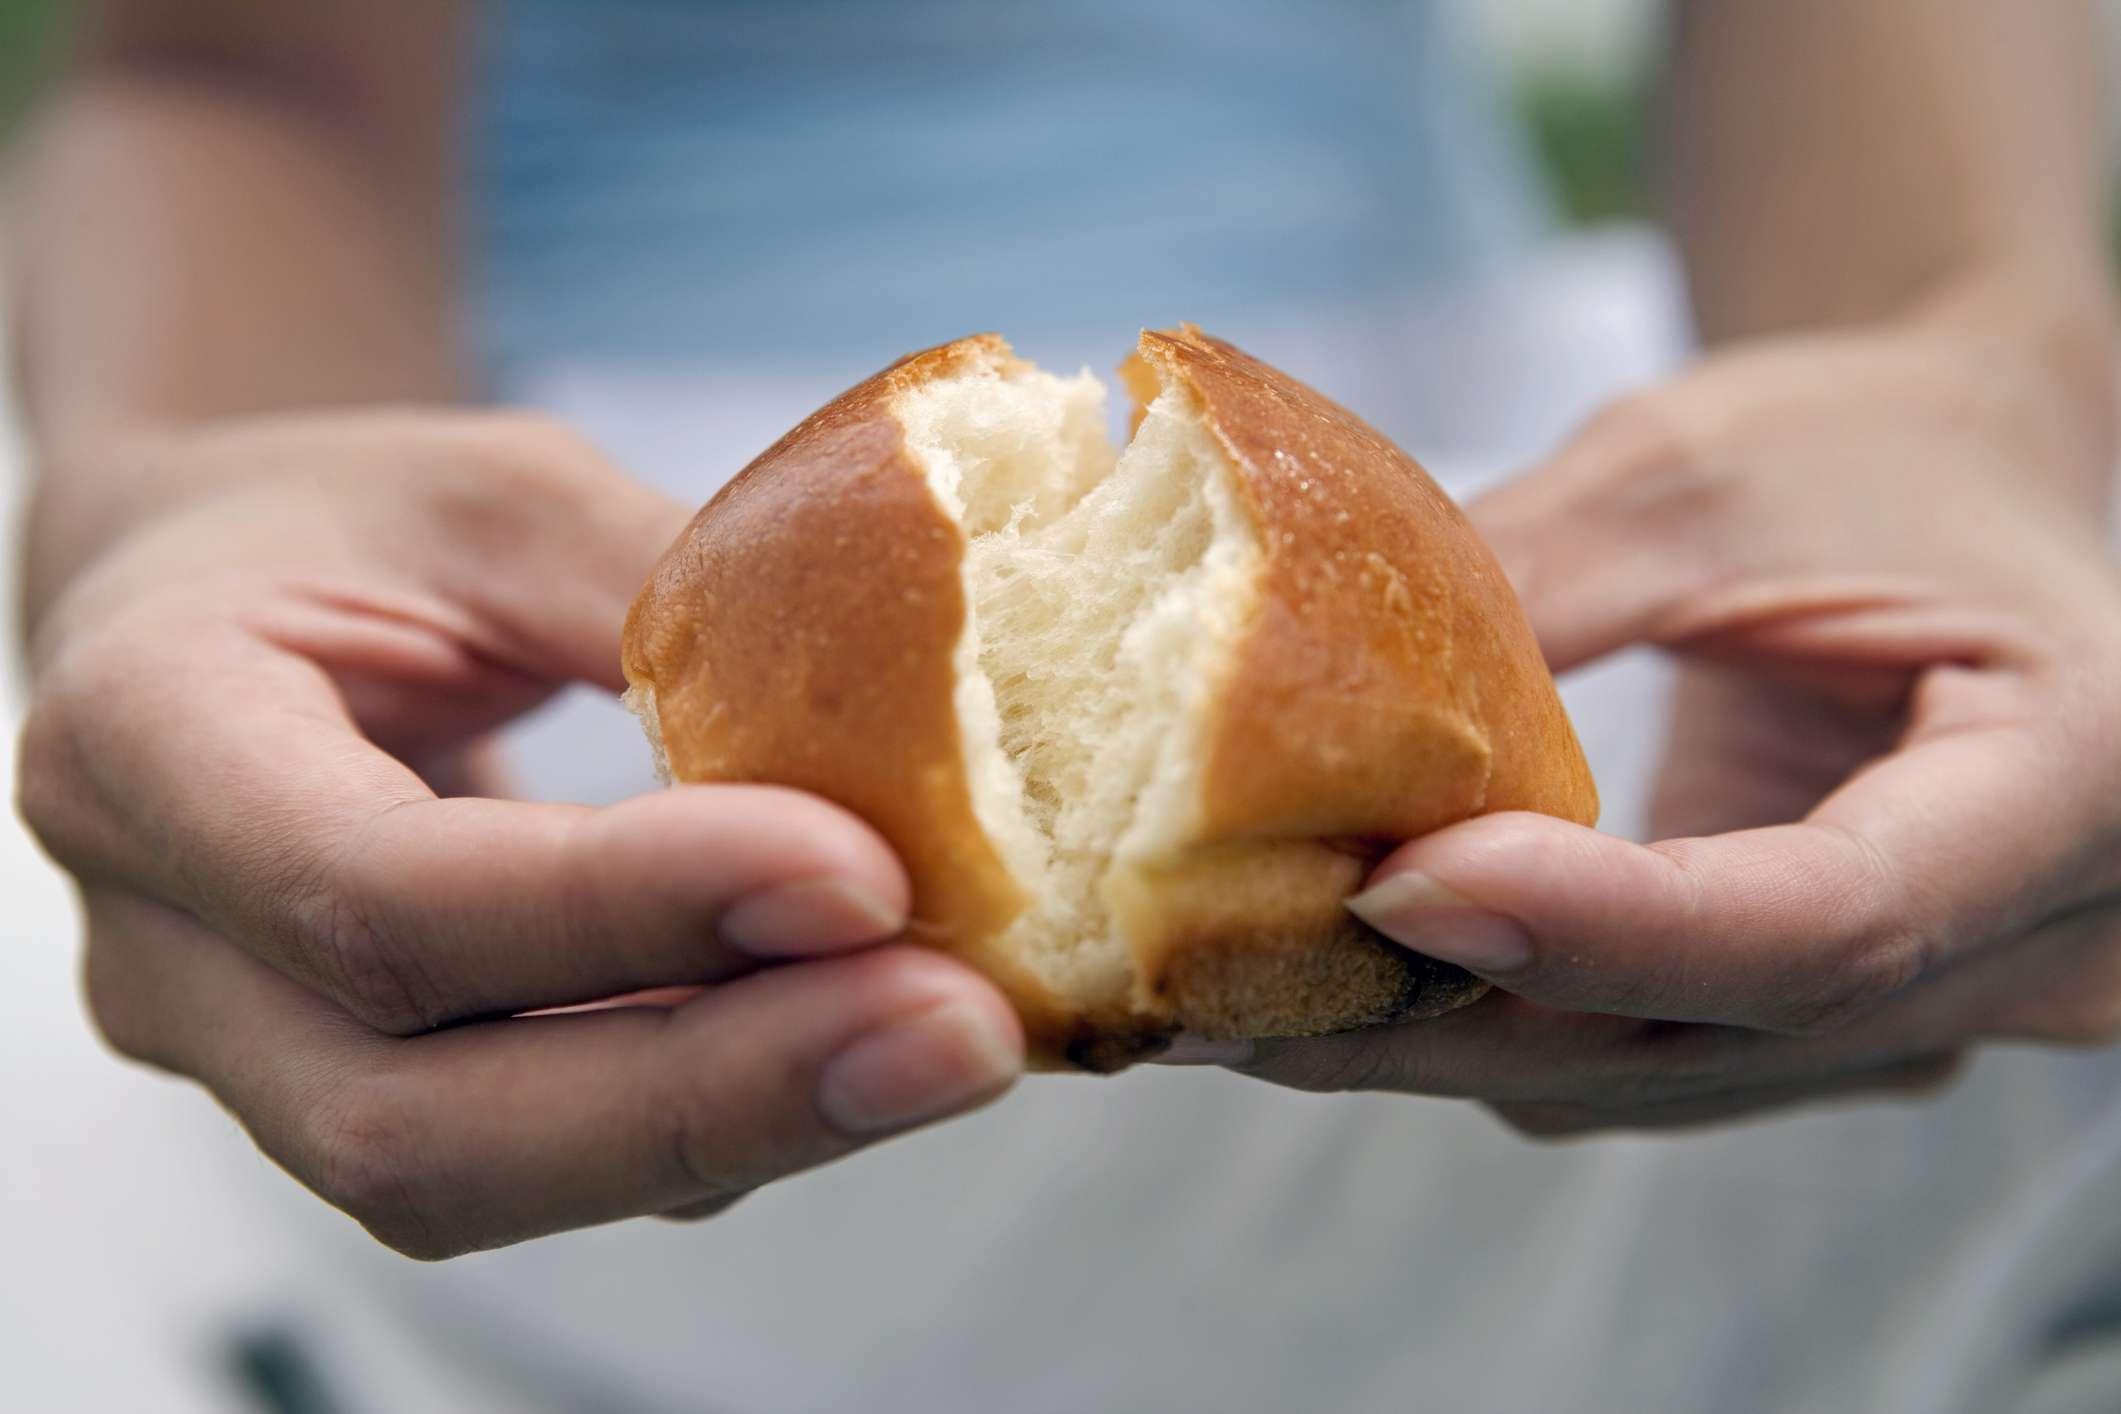 Woman's hands breaking bread